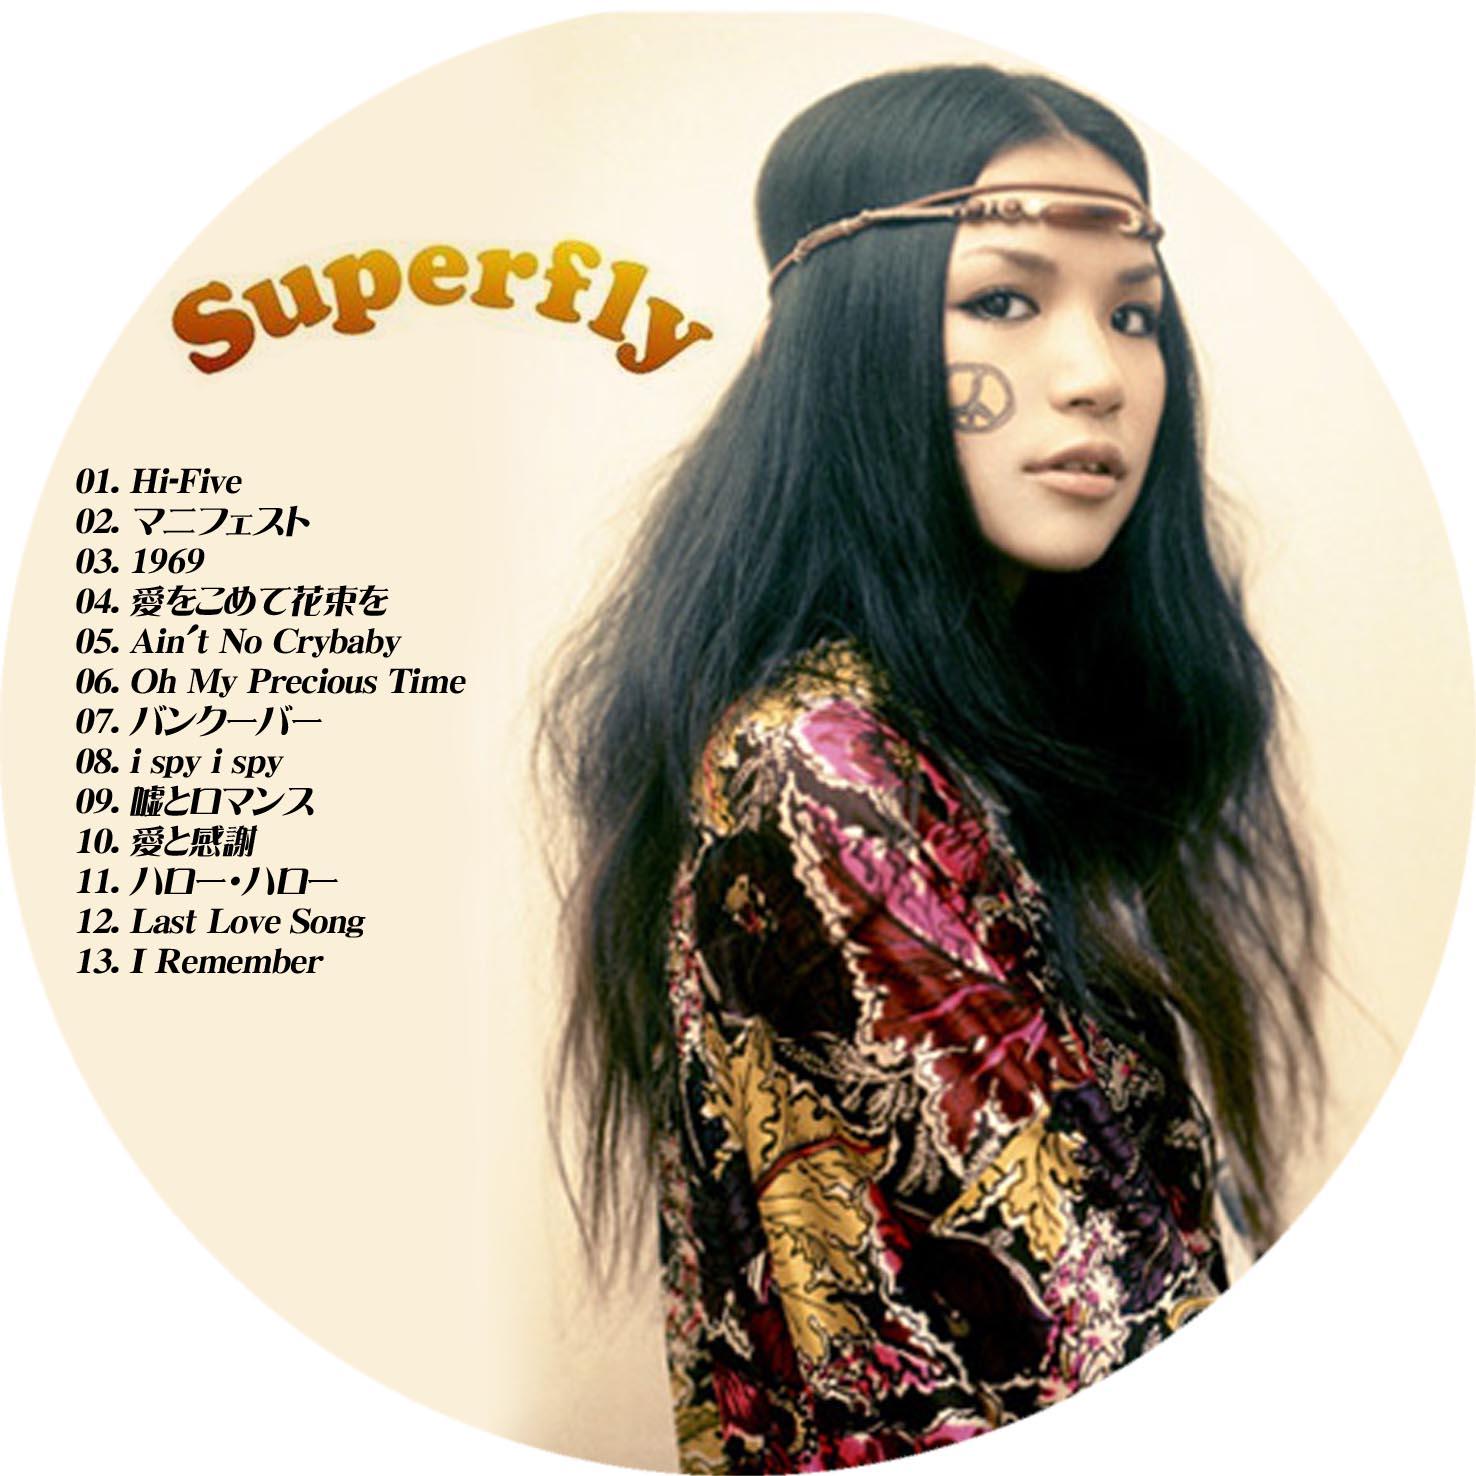 Superflyの画像 p1_29